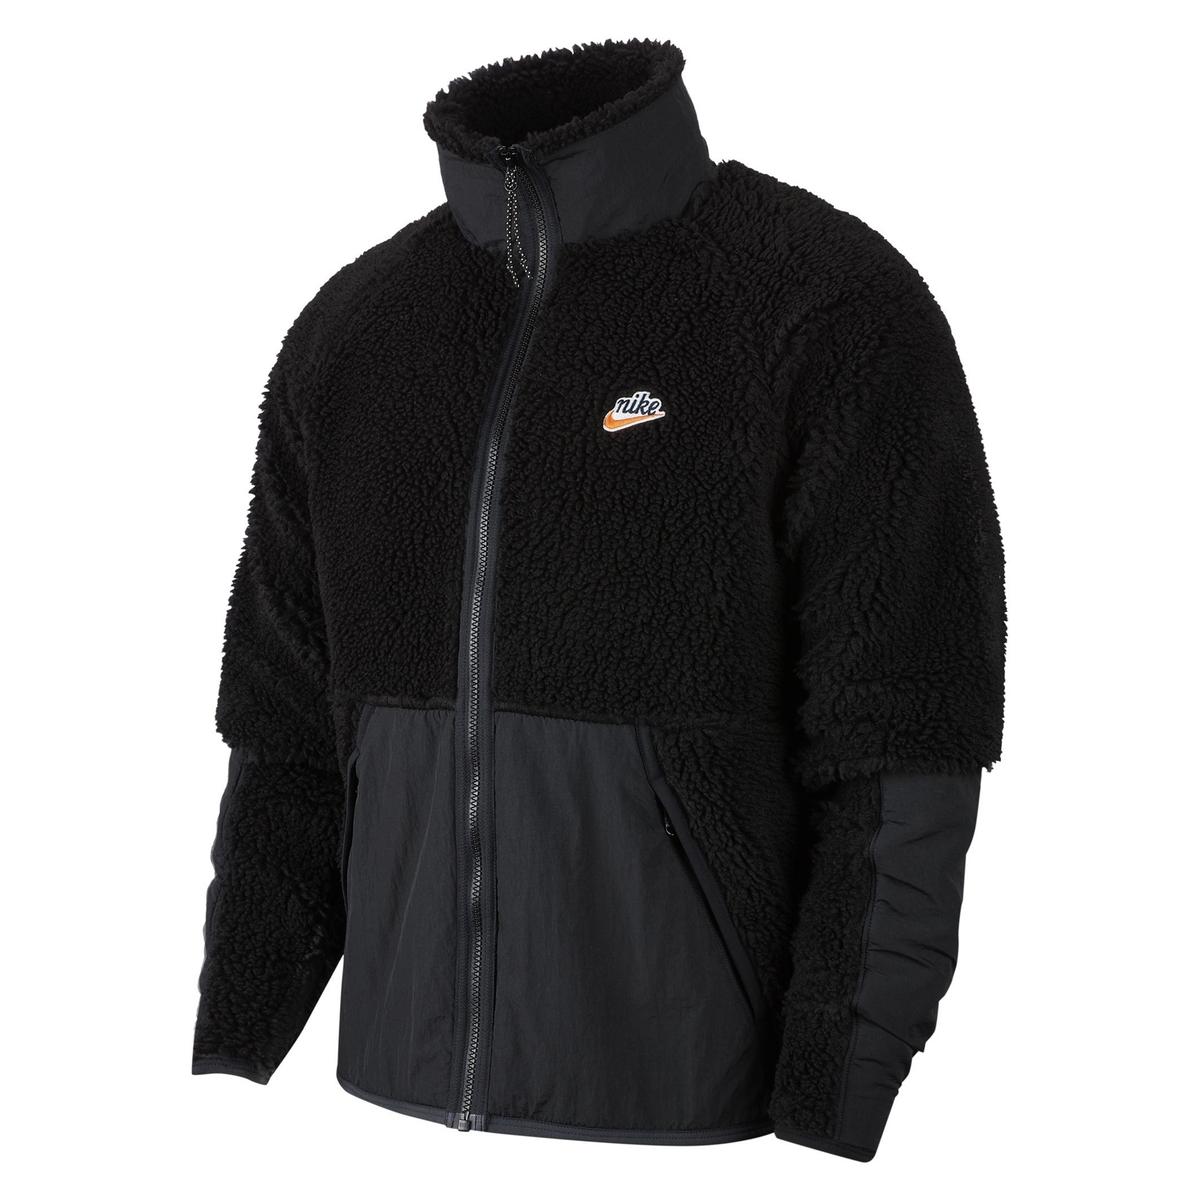 Sudadera de cuello alto con cremallera sherpa